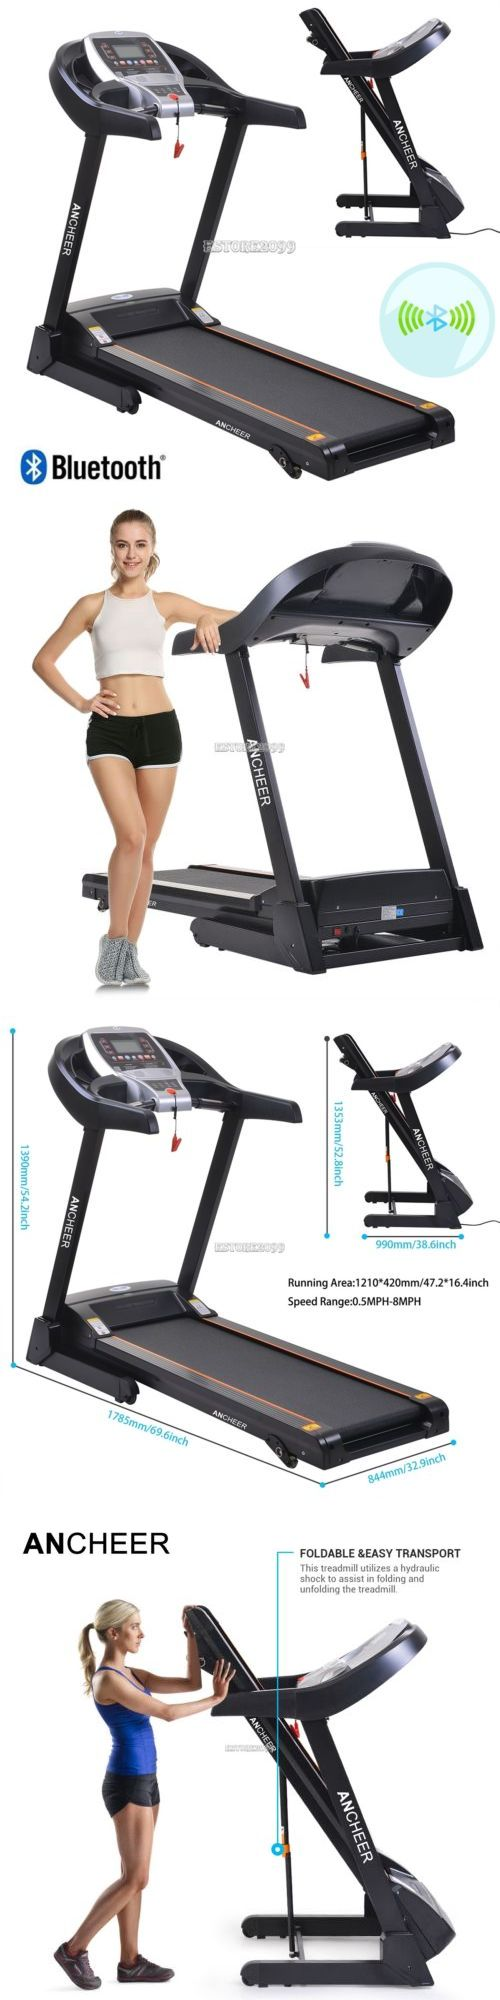 Treadmills 15280: Bluetooh Electric Treadmill Running Machine Motorized Cardio Gym>Mp3 ,Commercial -> BUY IT NOW ONLY: $454 on eBay!